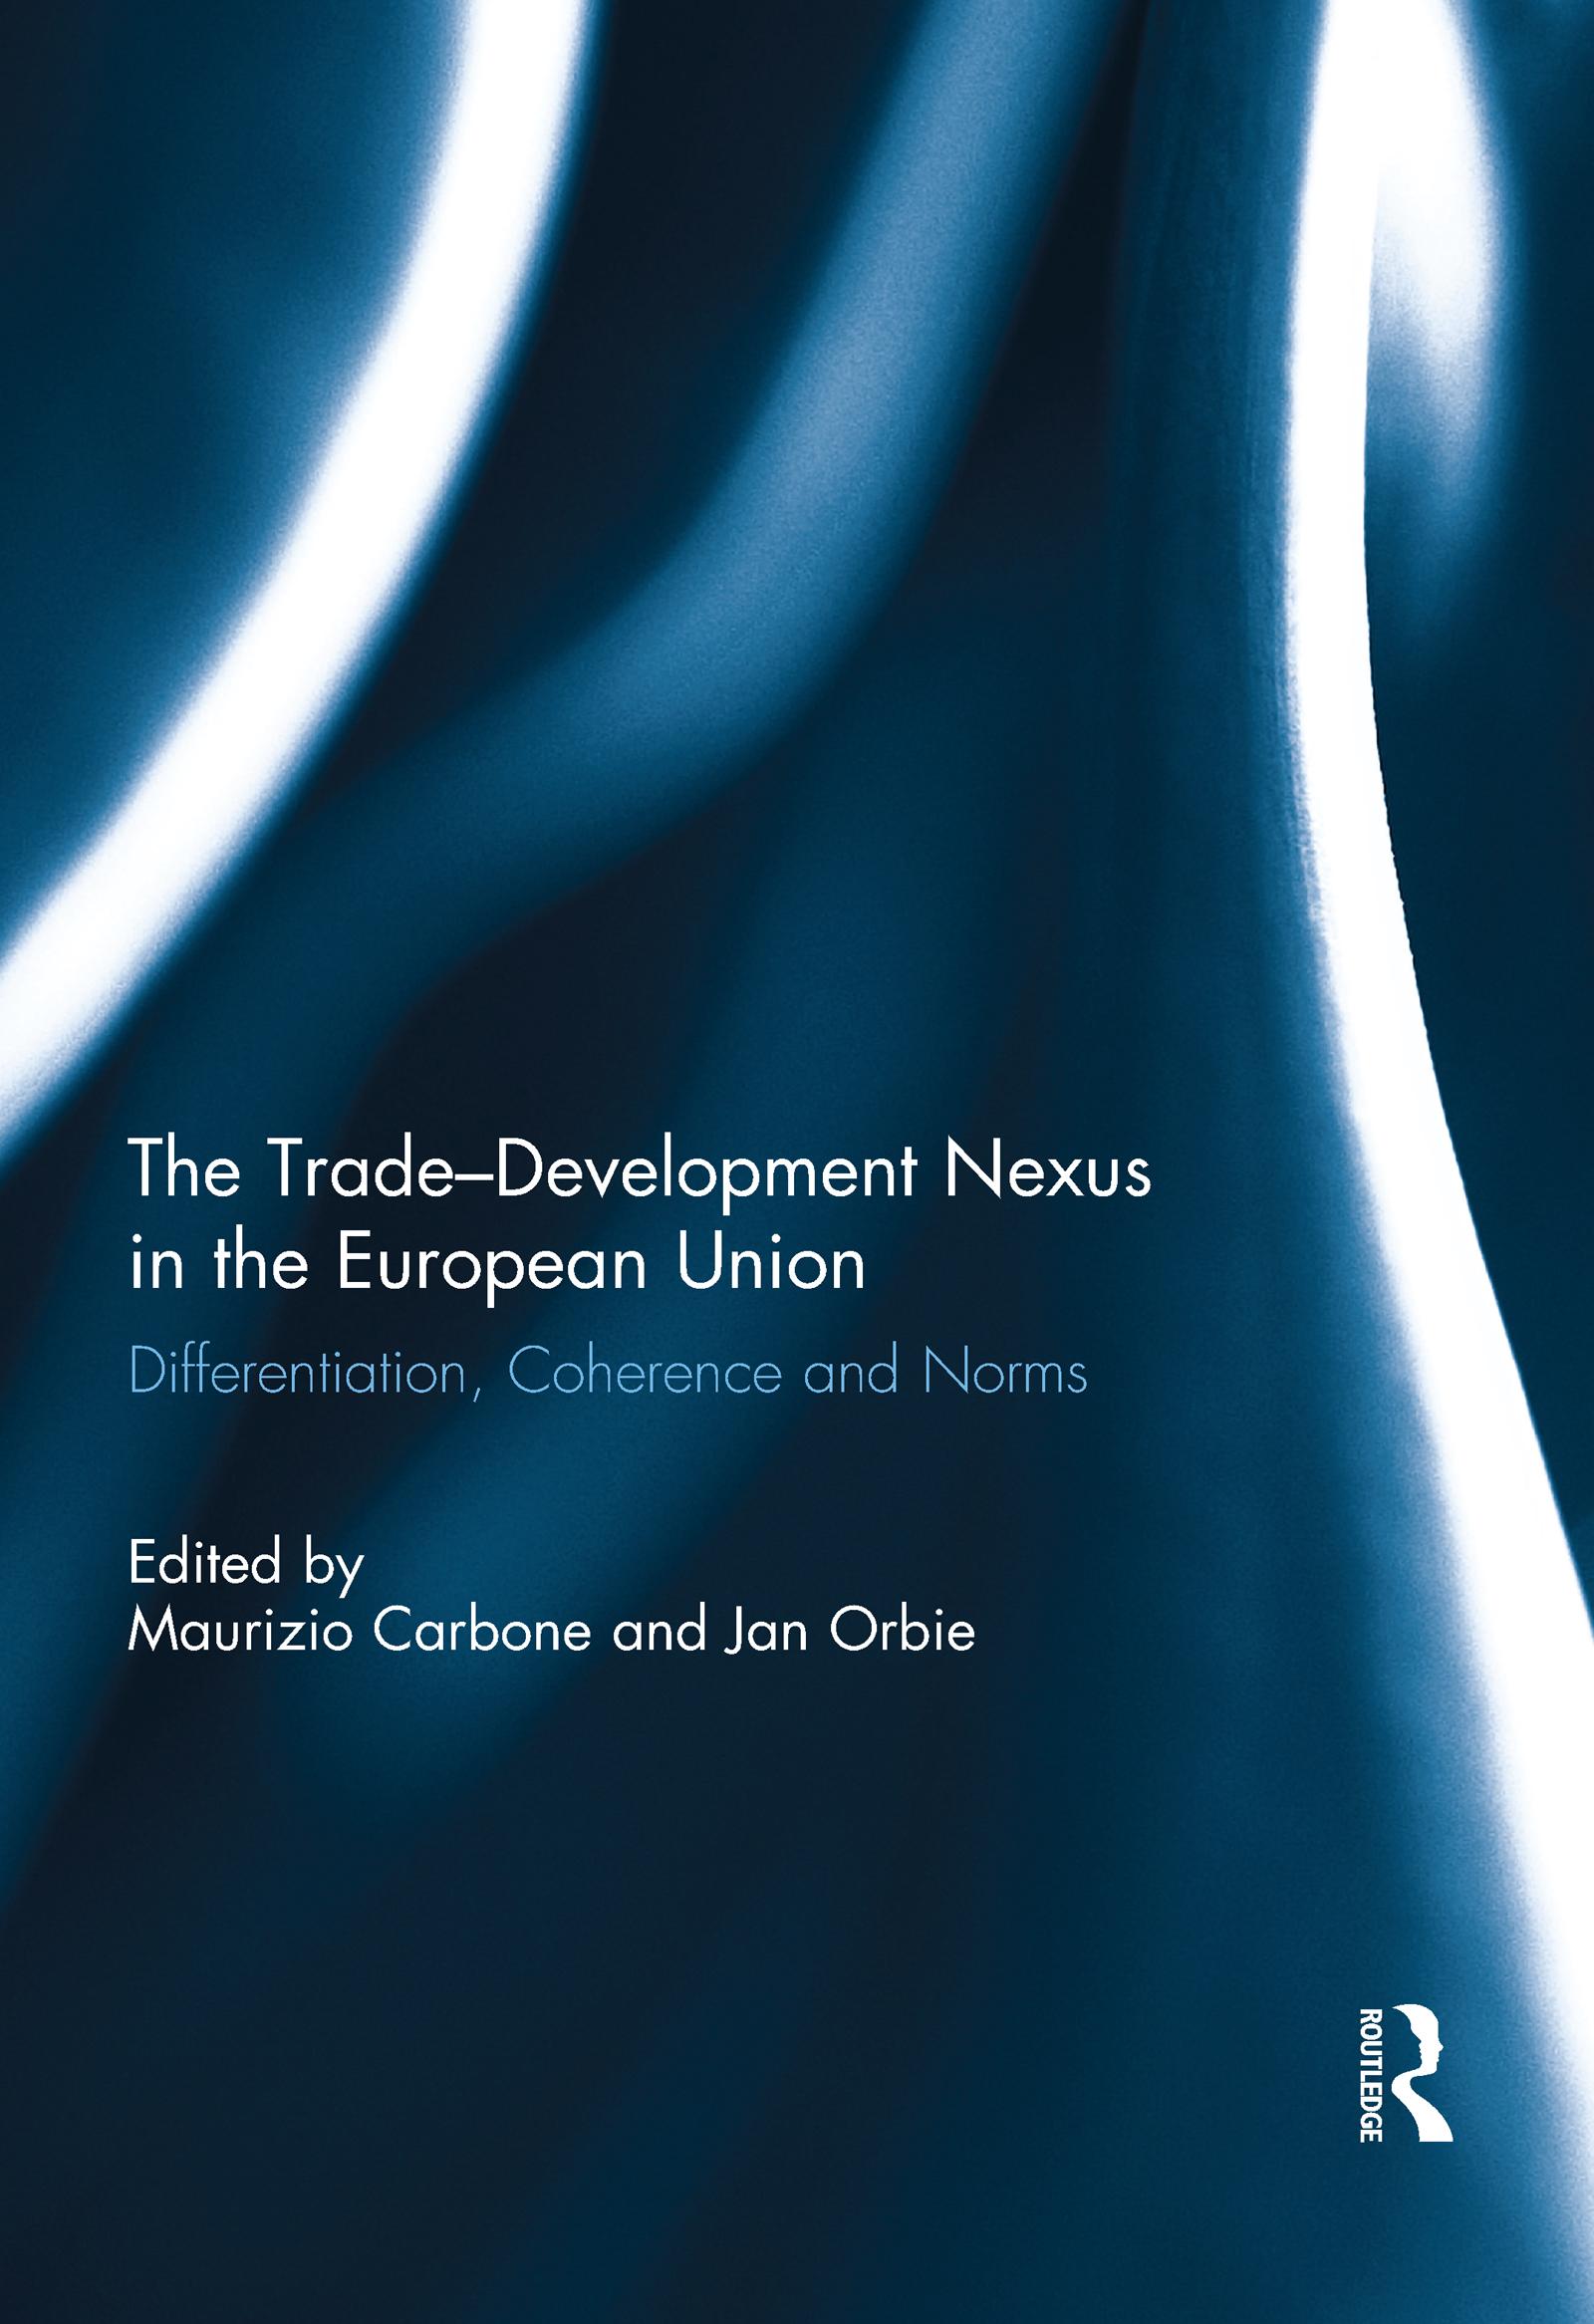 The Trade-Development Nexus in the European Union